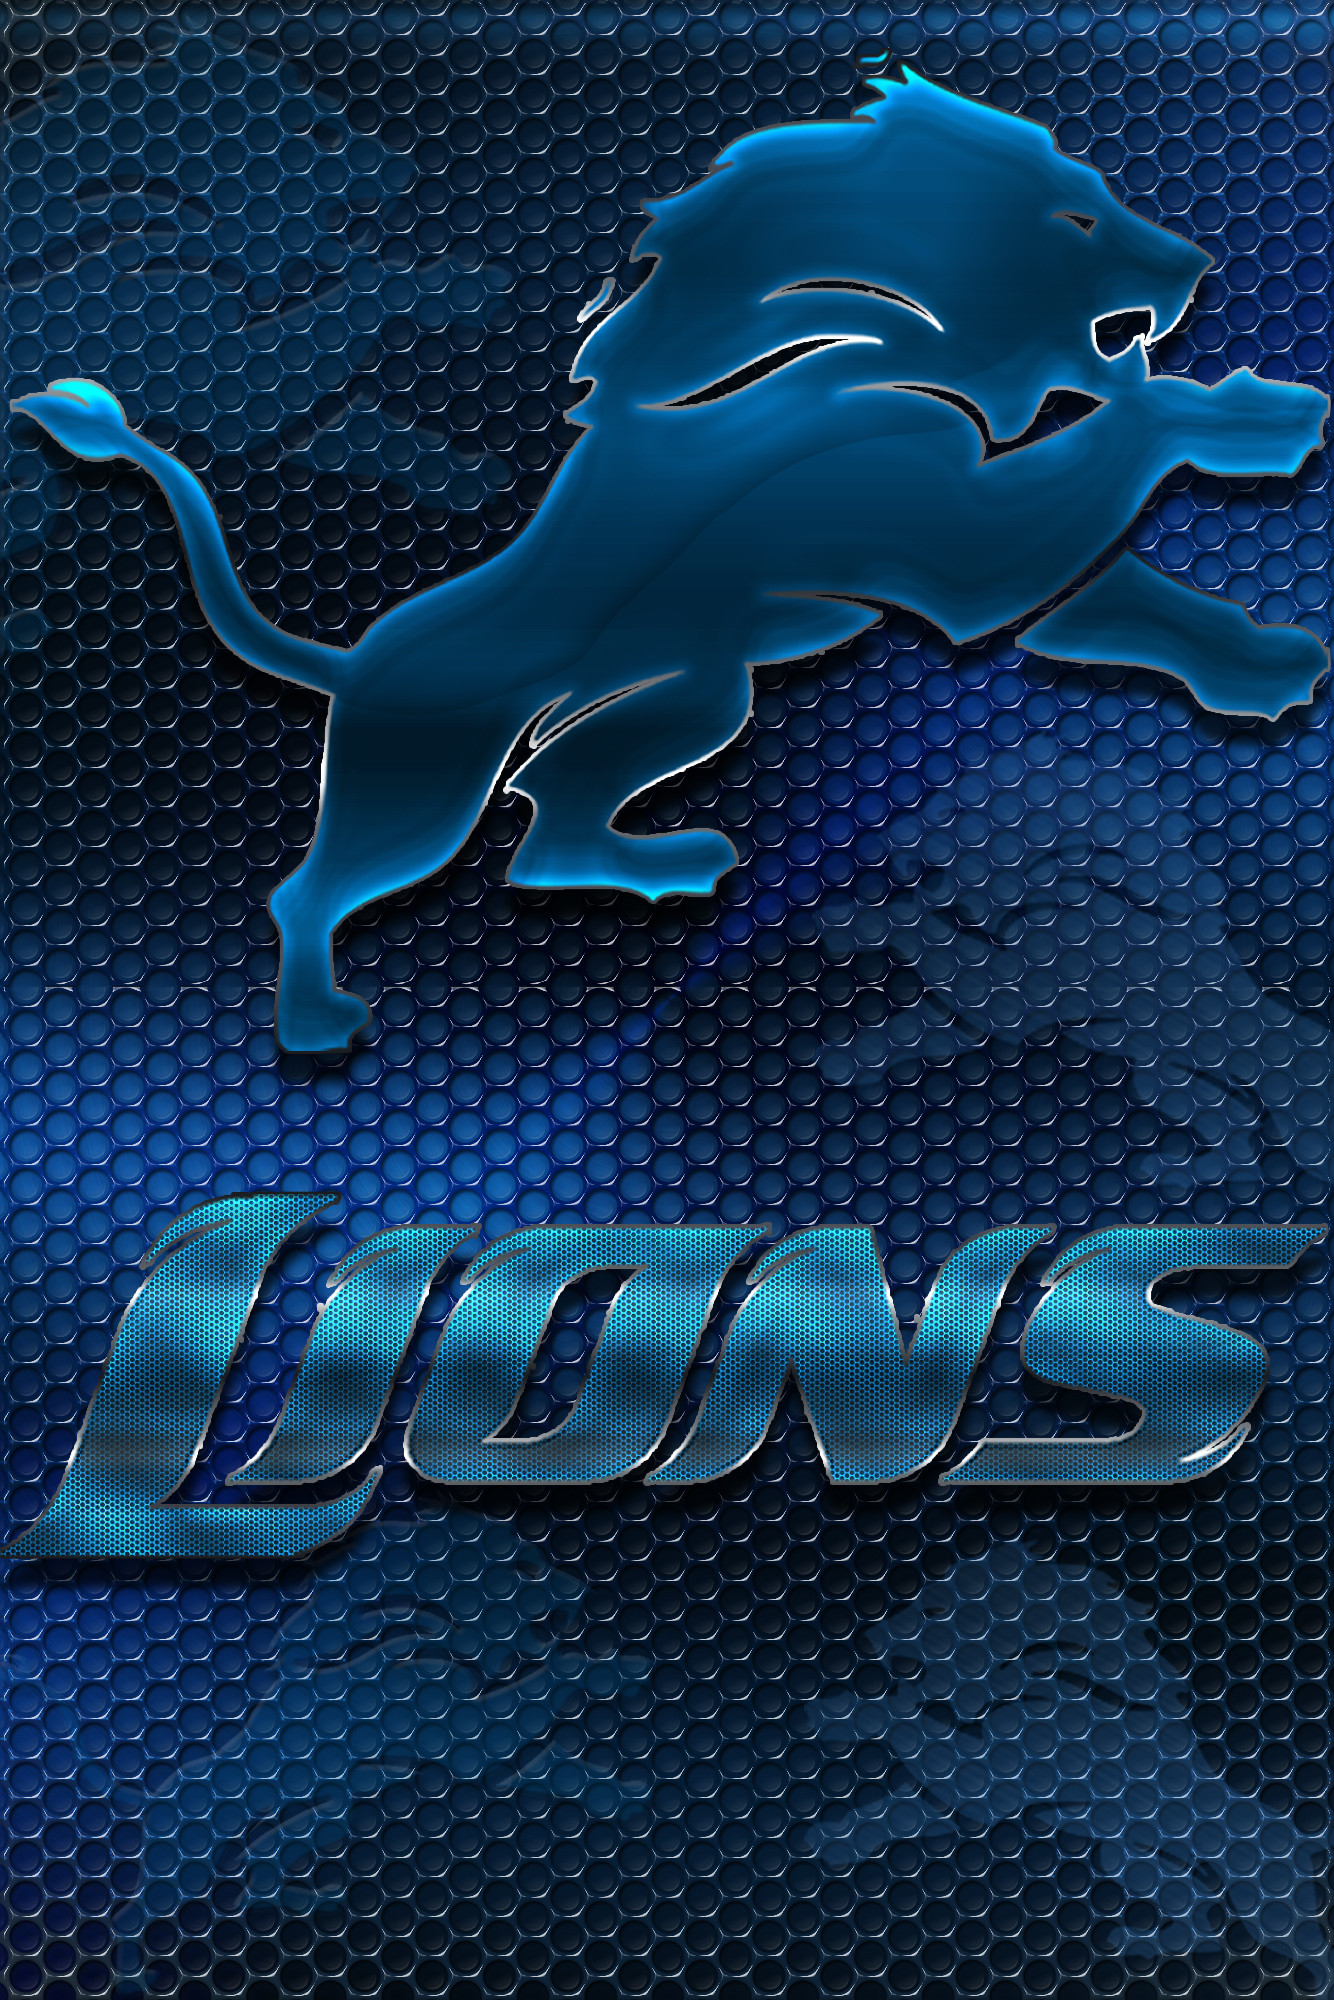 Detroit Lions 2012 Heavy Metal Wallpaper   Free Download Wallpaper .